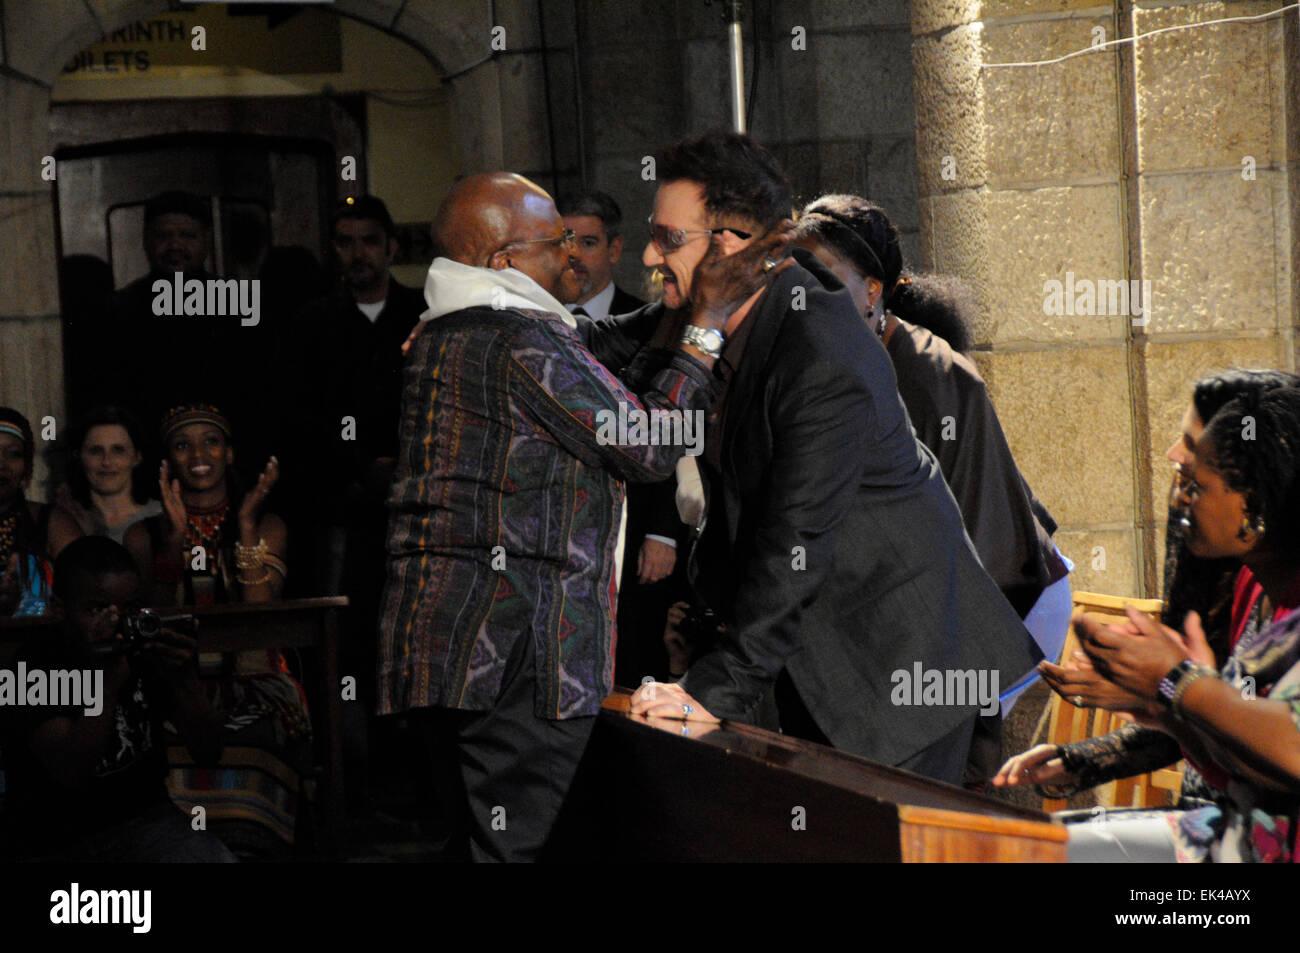 Archbishop Desmond Tutu hugs Irish Rock Star Bono at the book launch of Tutu,The Authorised Portrait during a week - Stock Image